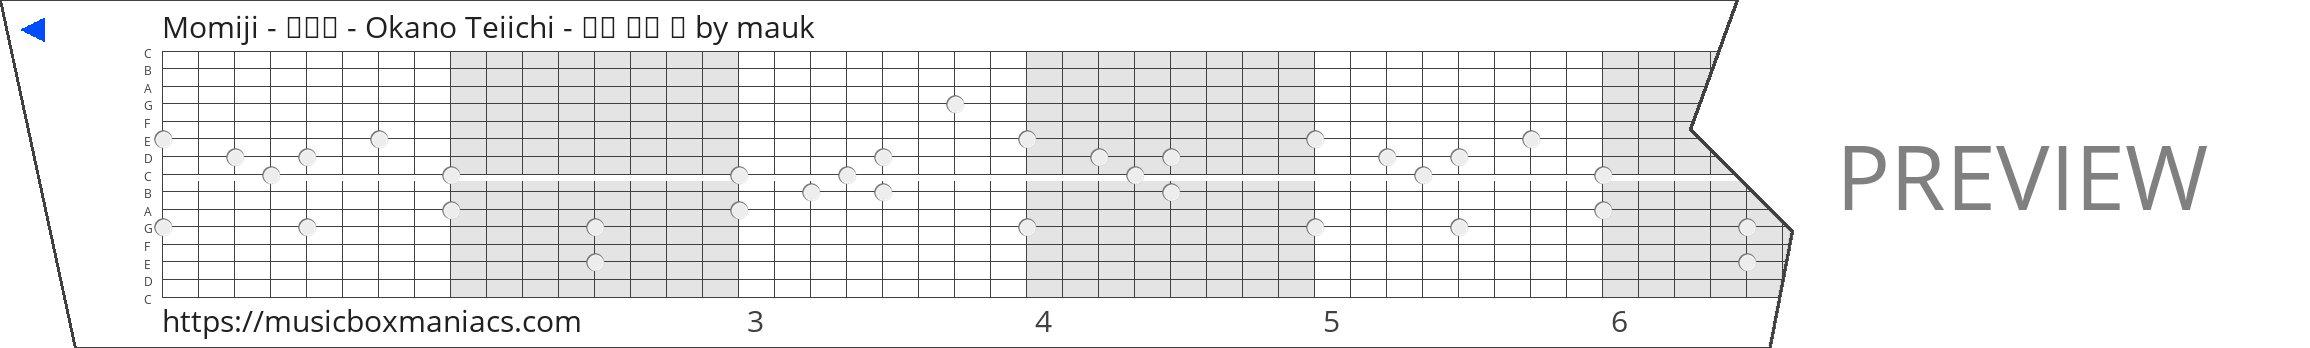 Momiji - もみじ - Okano Teiichi - 岡野 貞一 🍁 15 note music box paper strip